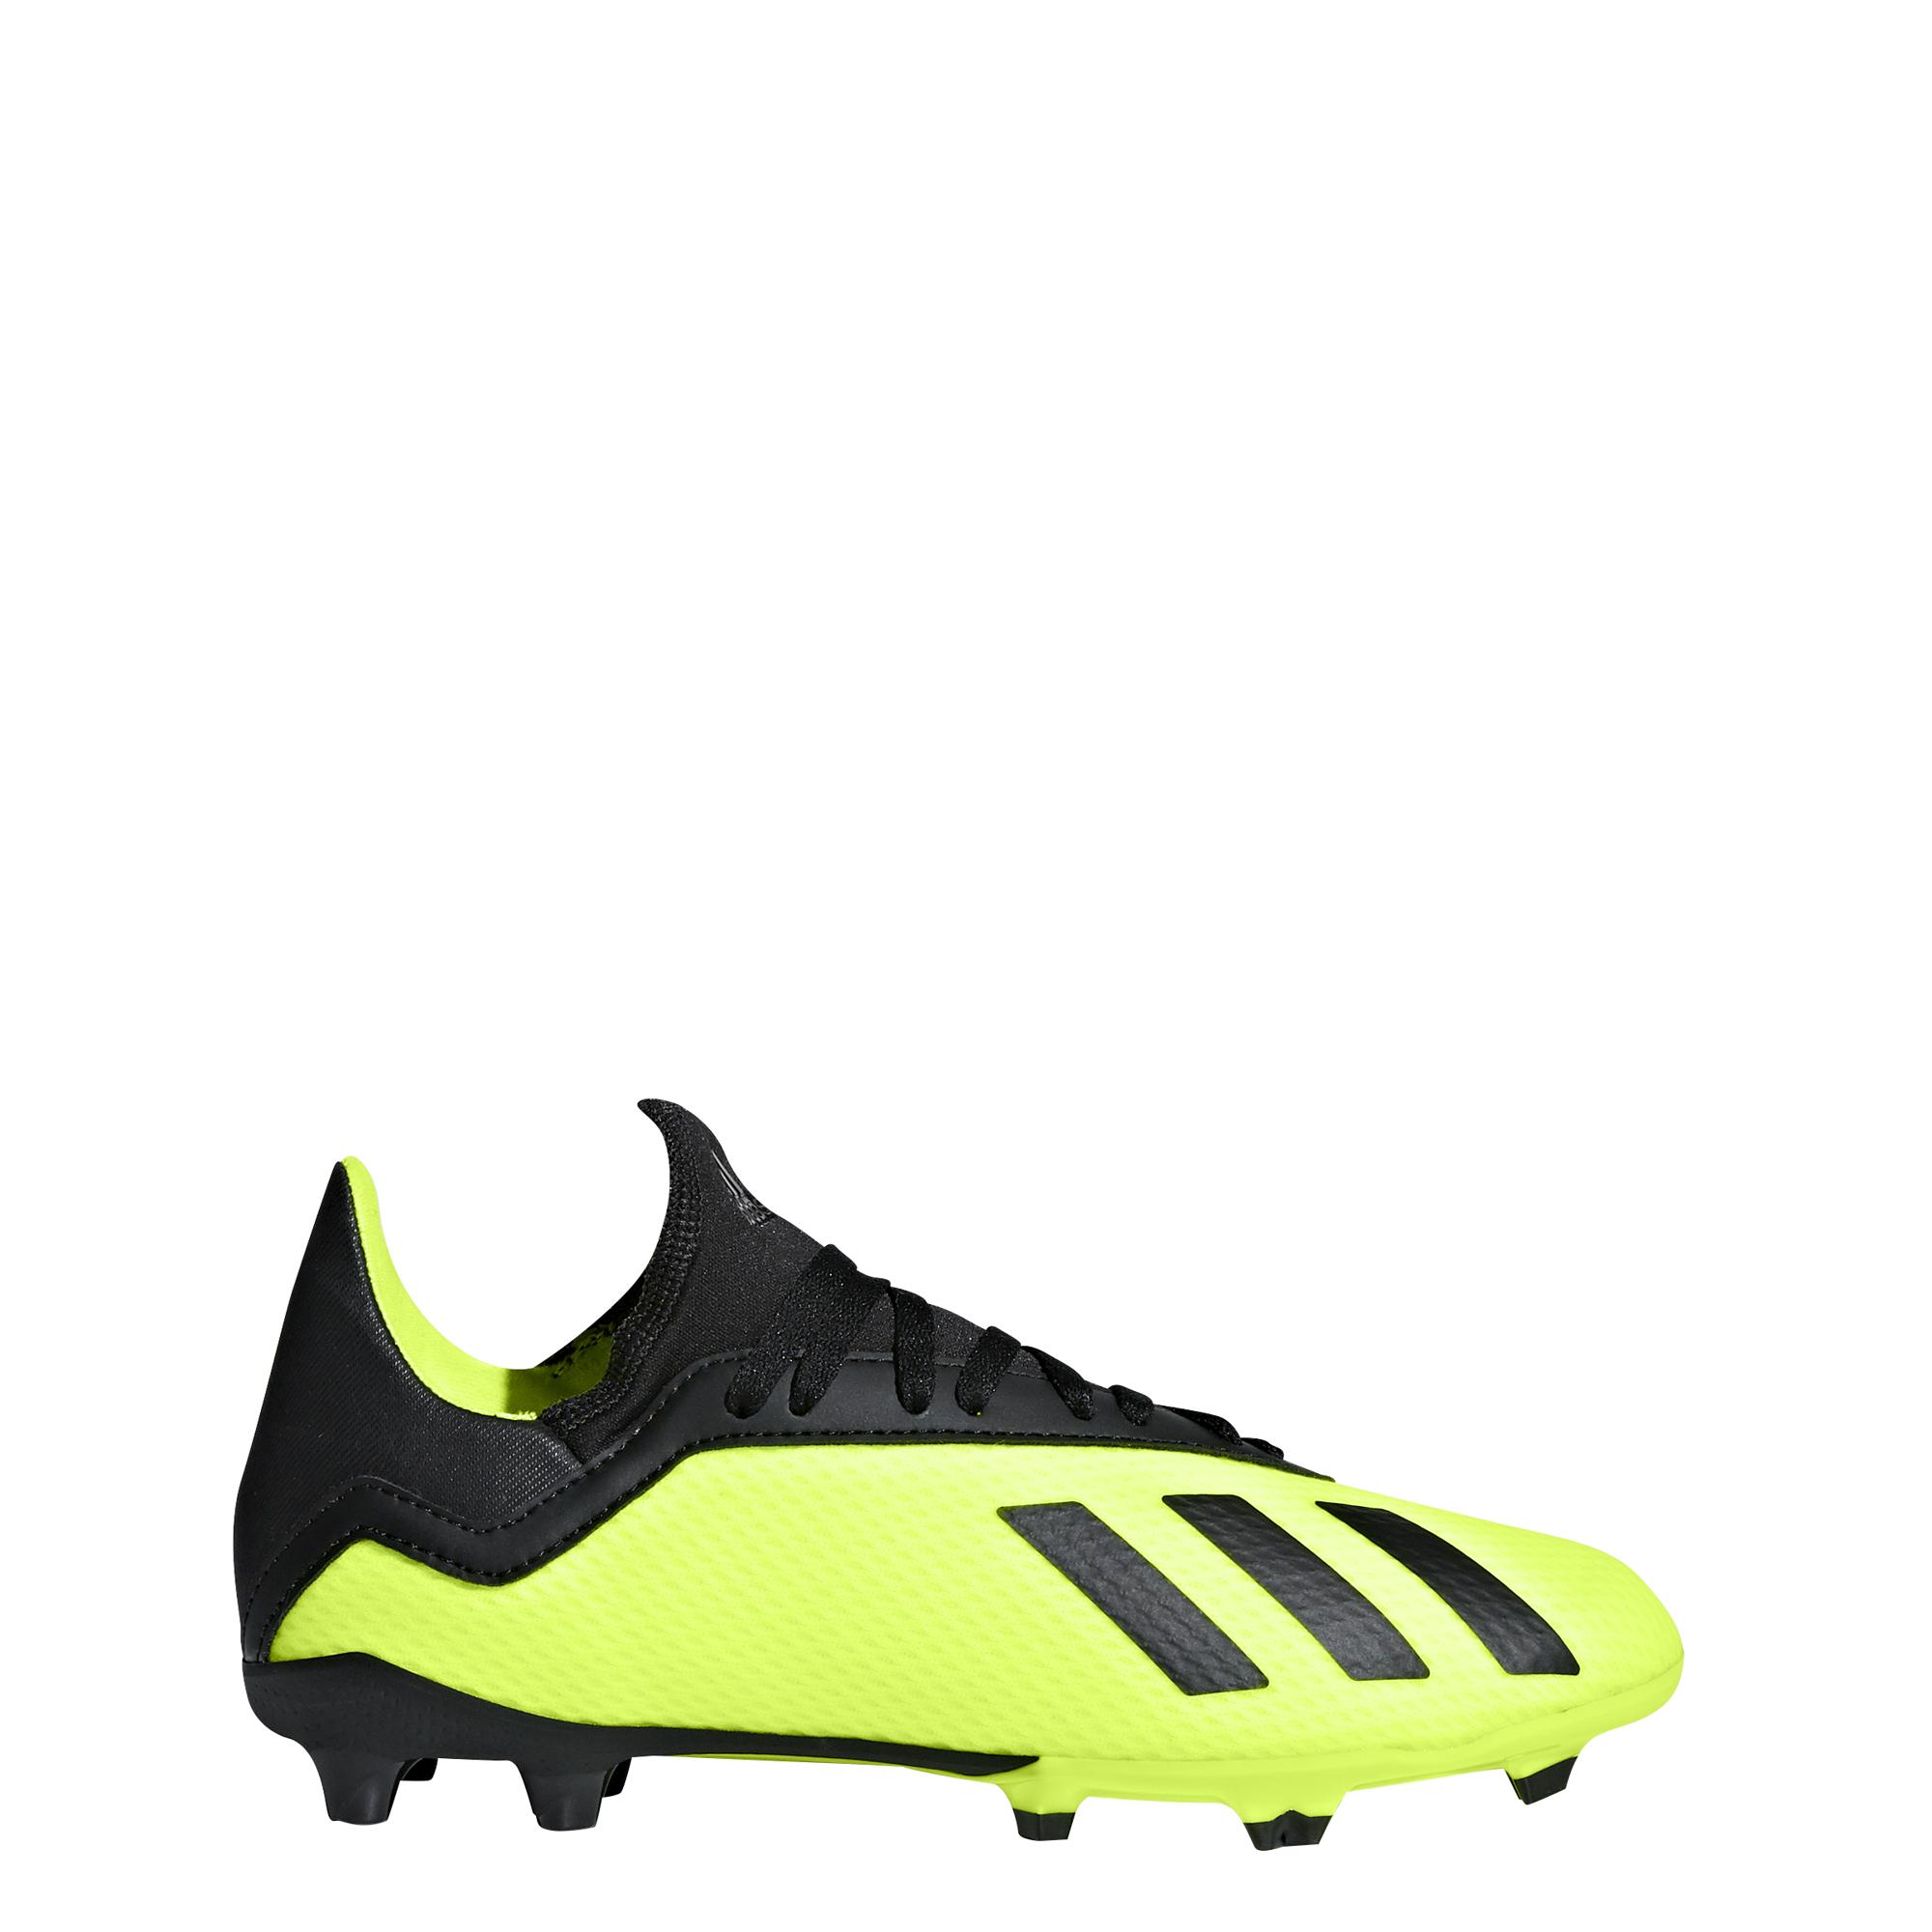 Adidas Bambini Scarpe da Calcio Predator 18.4 Fg con Tacchetti  bd10e96c1ab